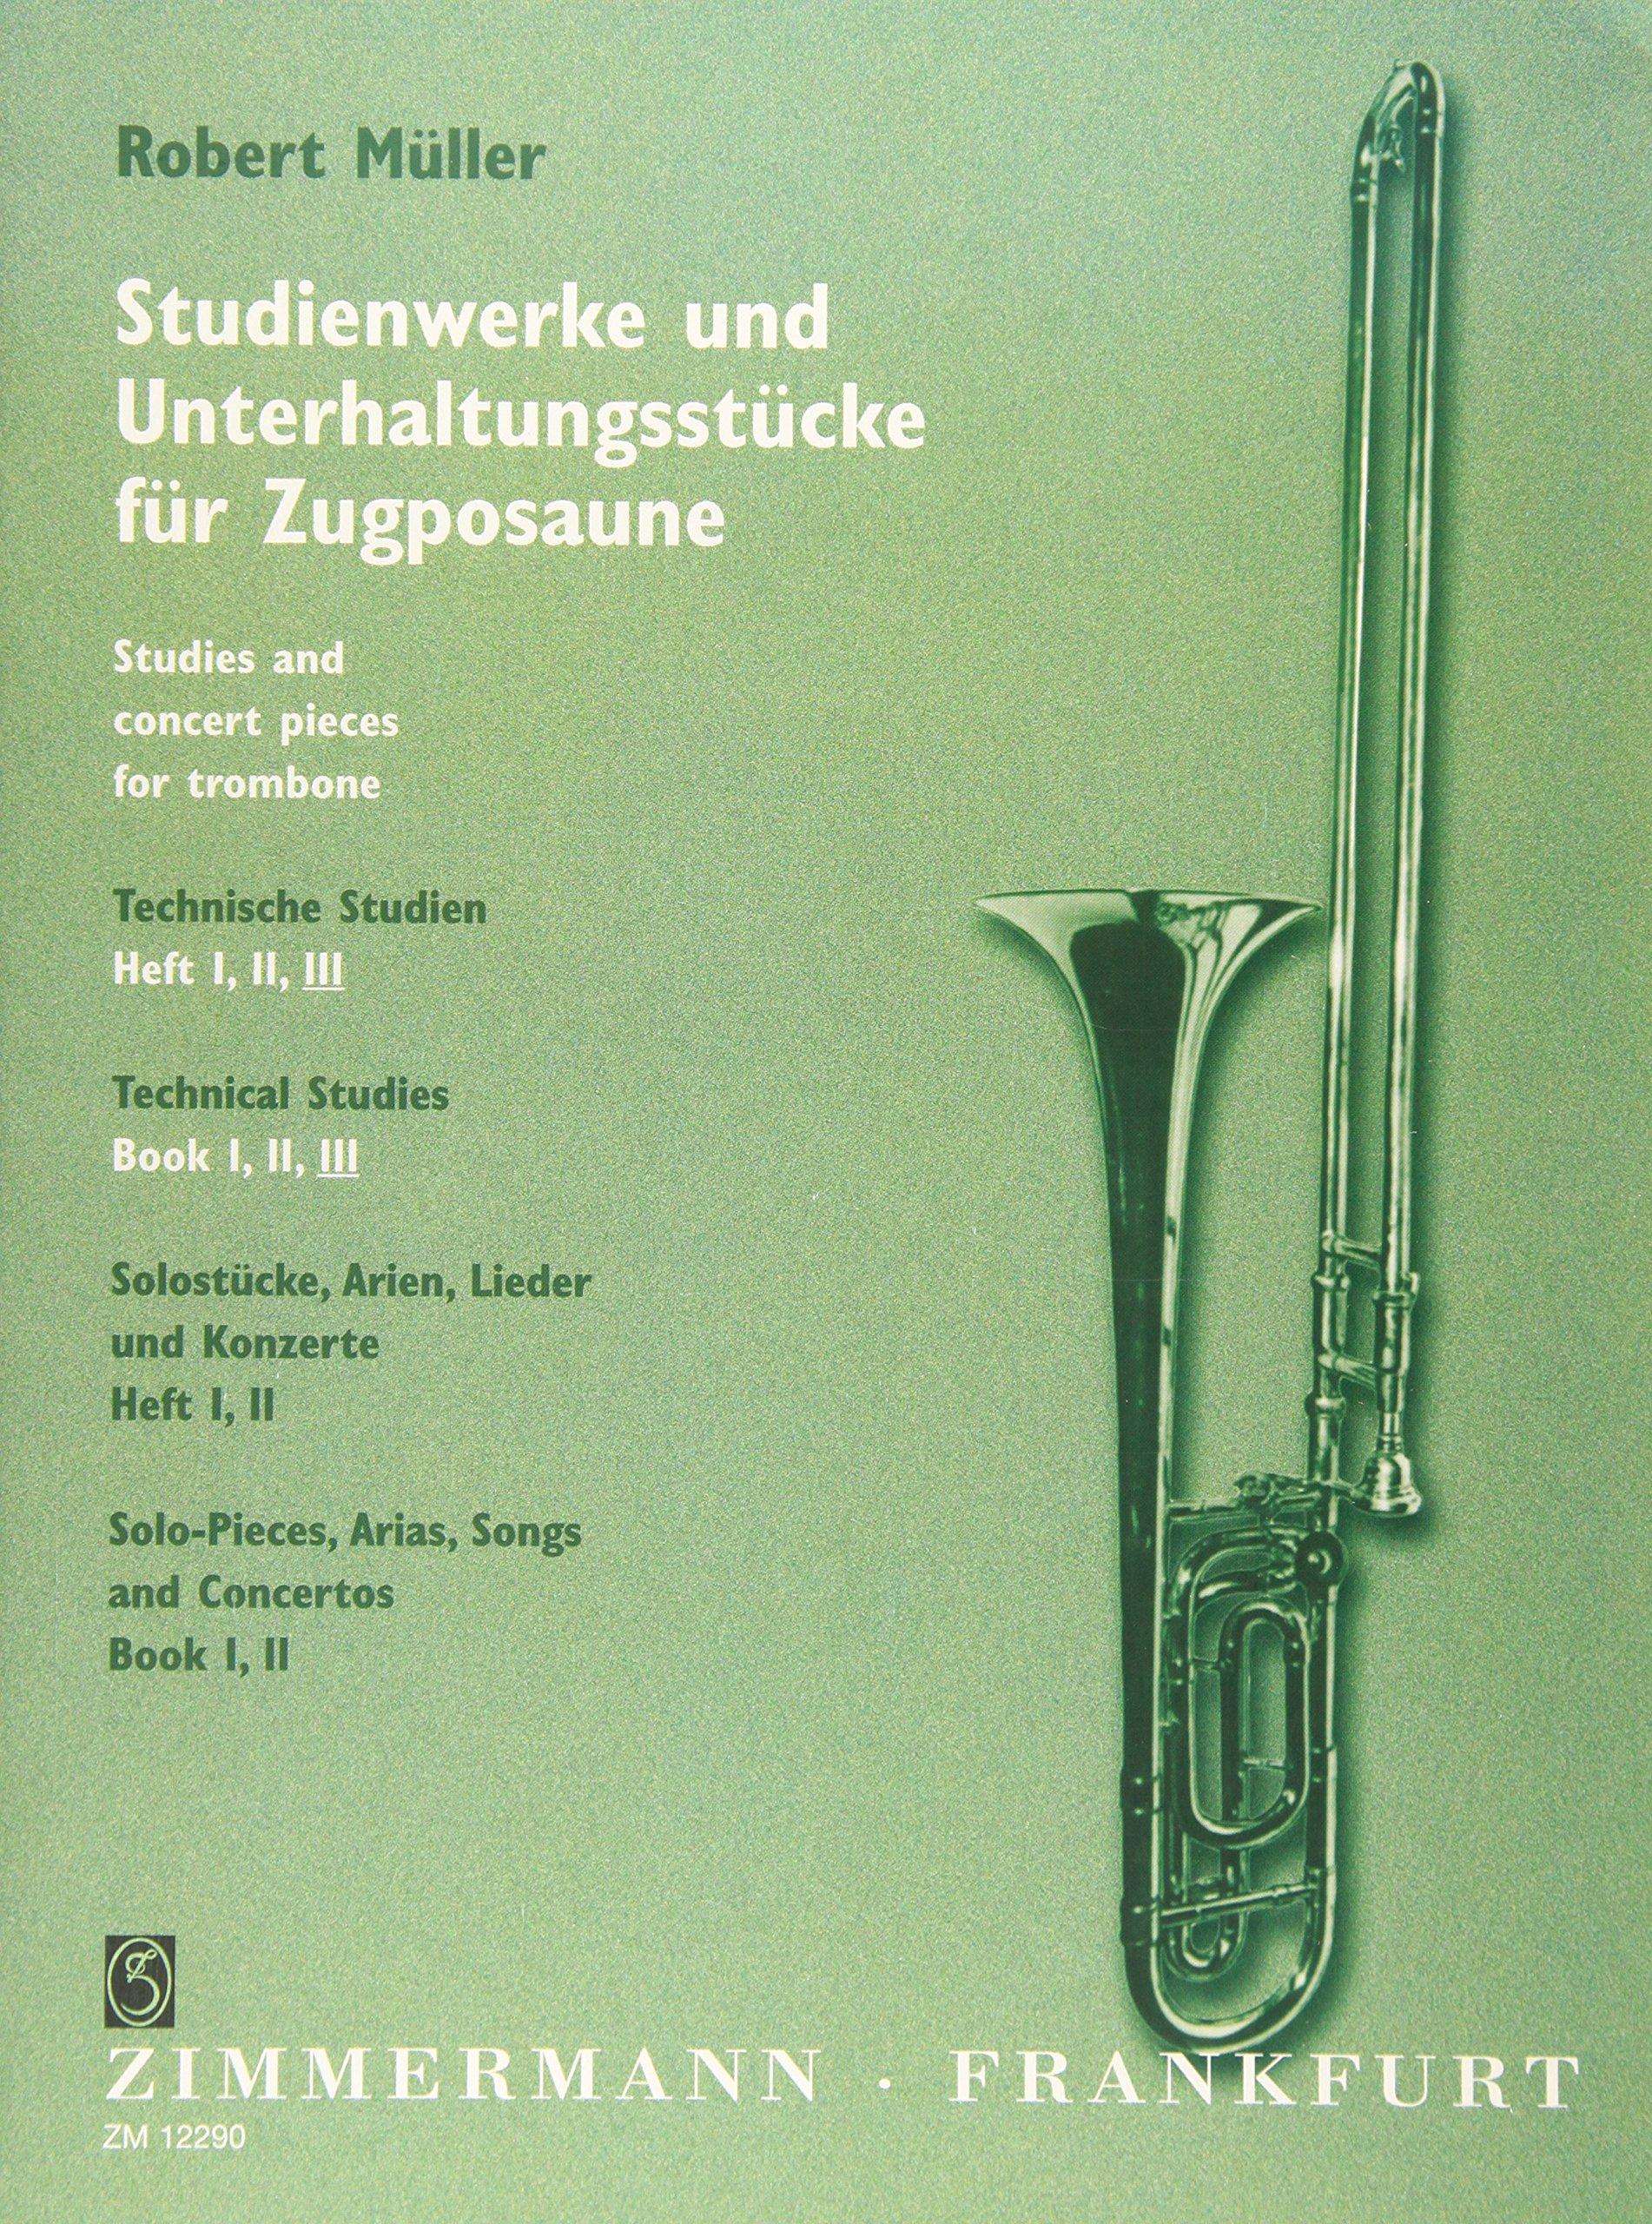 Technische Studien: Heft 3. Posaune. Musiknoten – 1. April 2000 Robert Müller B00008D0T8 LA9790010122908 Musikalien